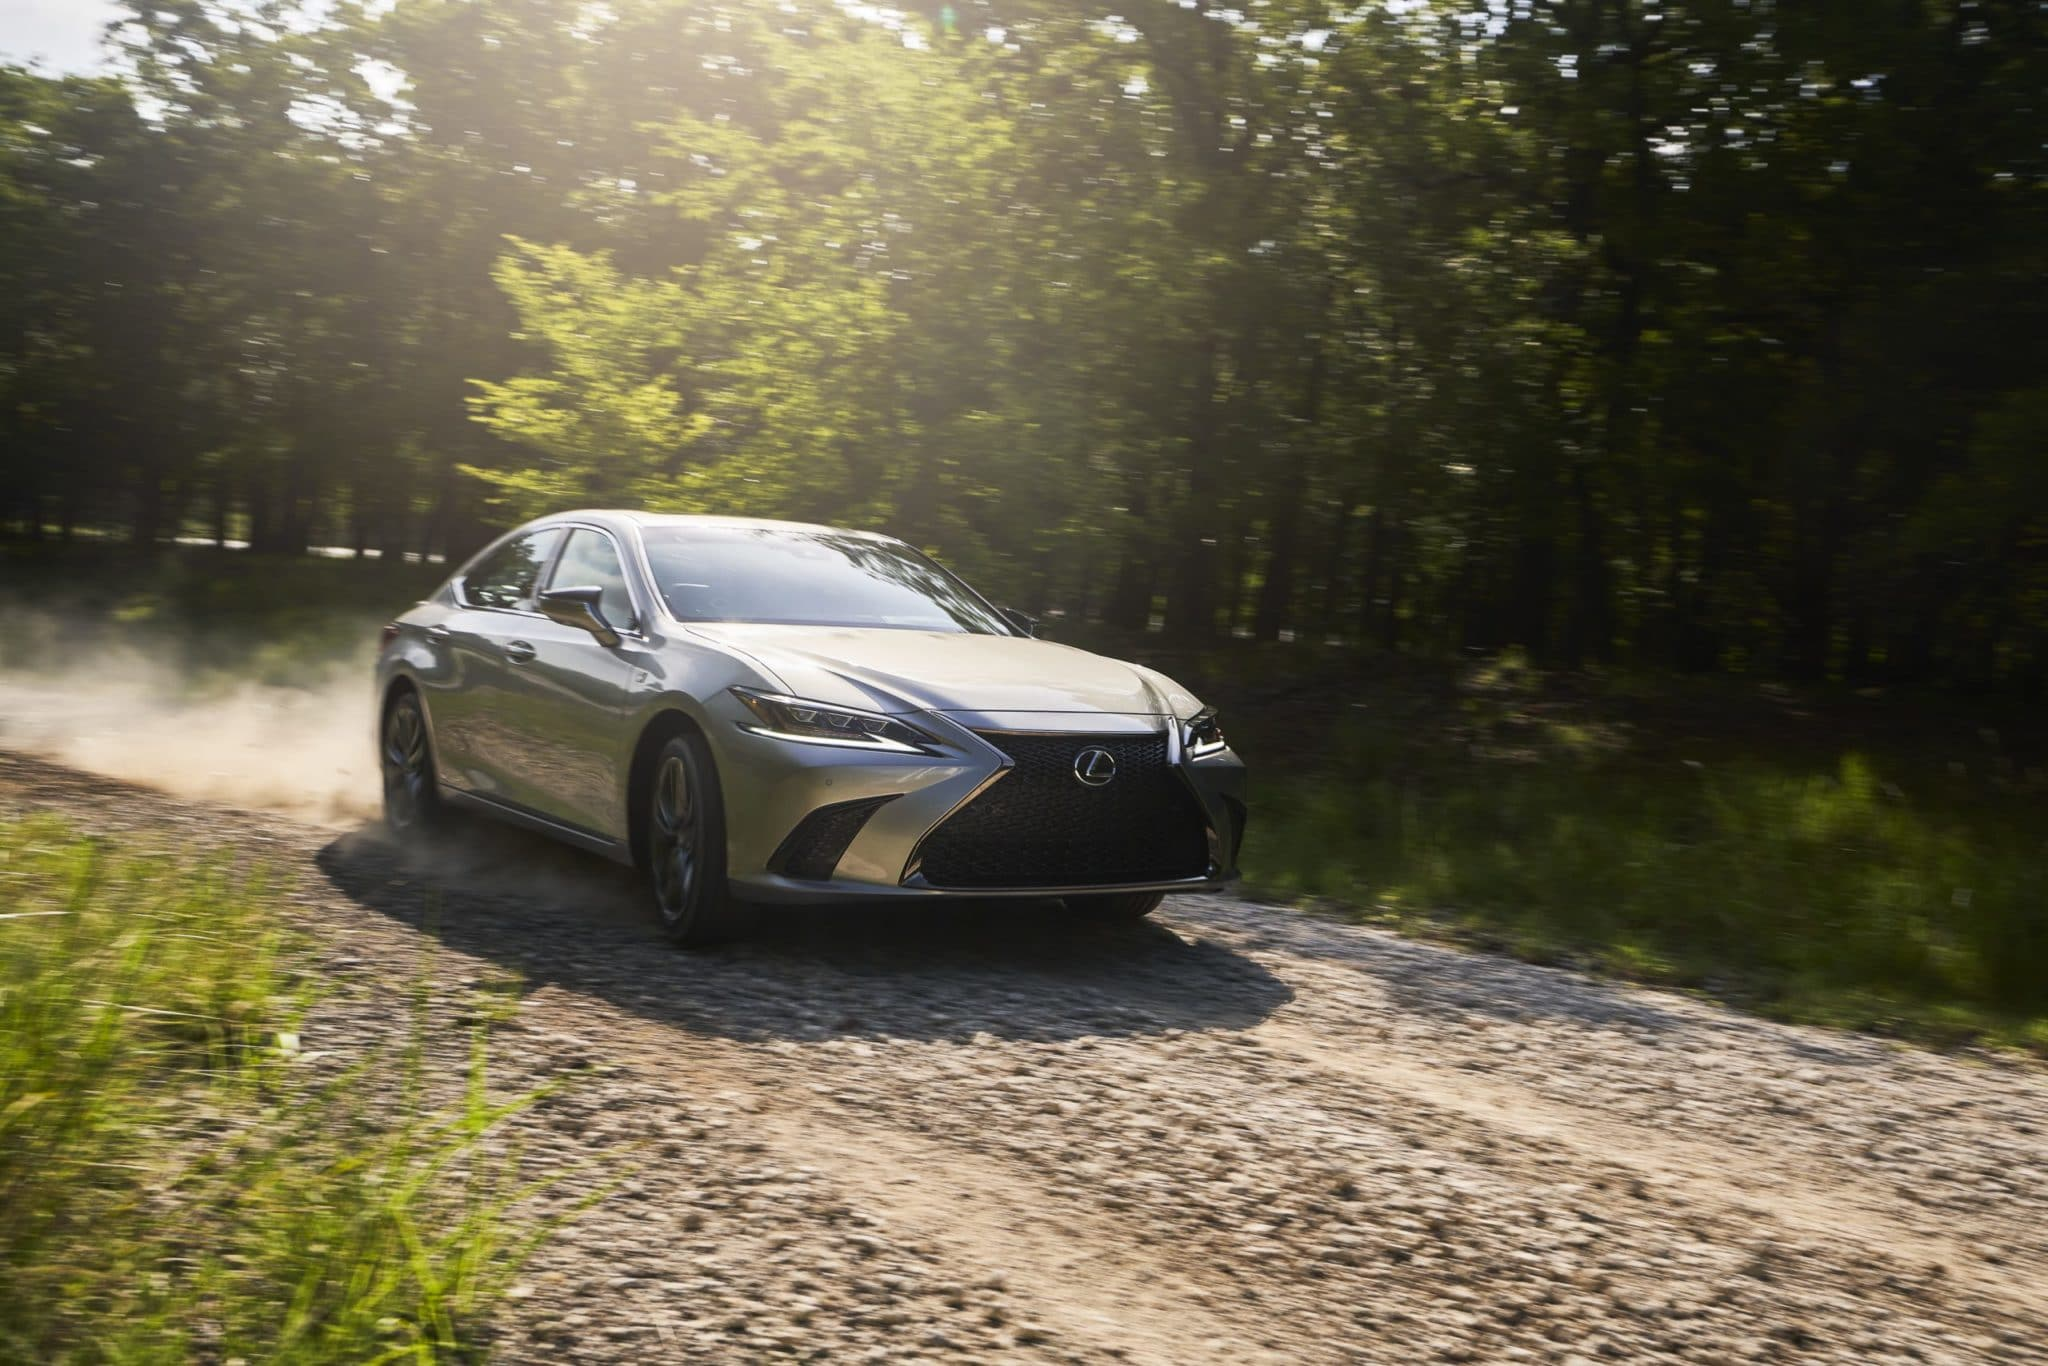 2021 Lexus ES 250 All-Wheel-Drive